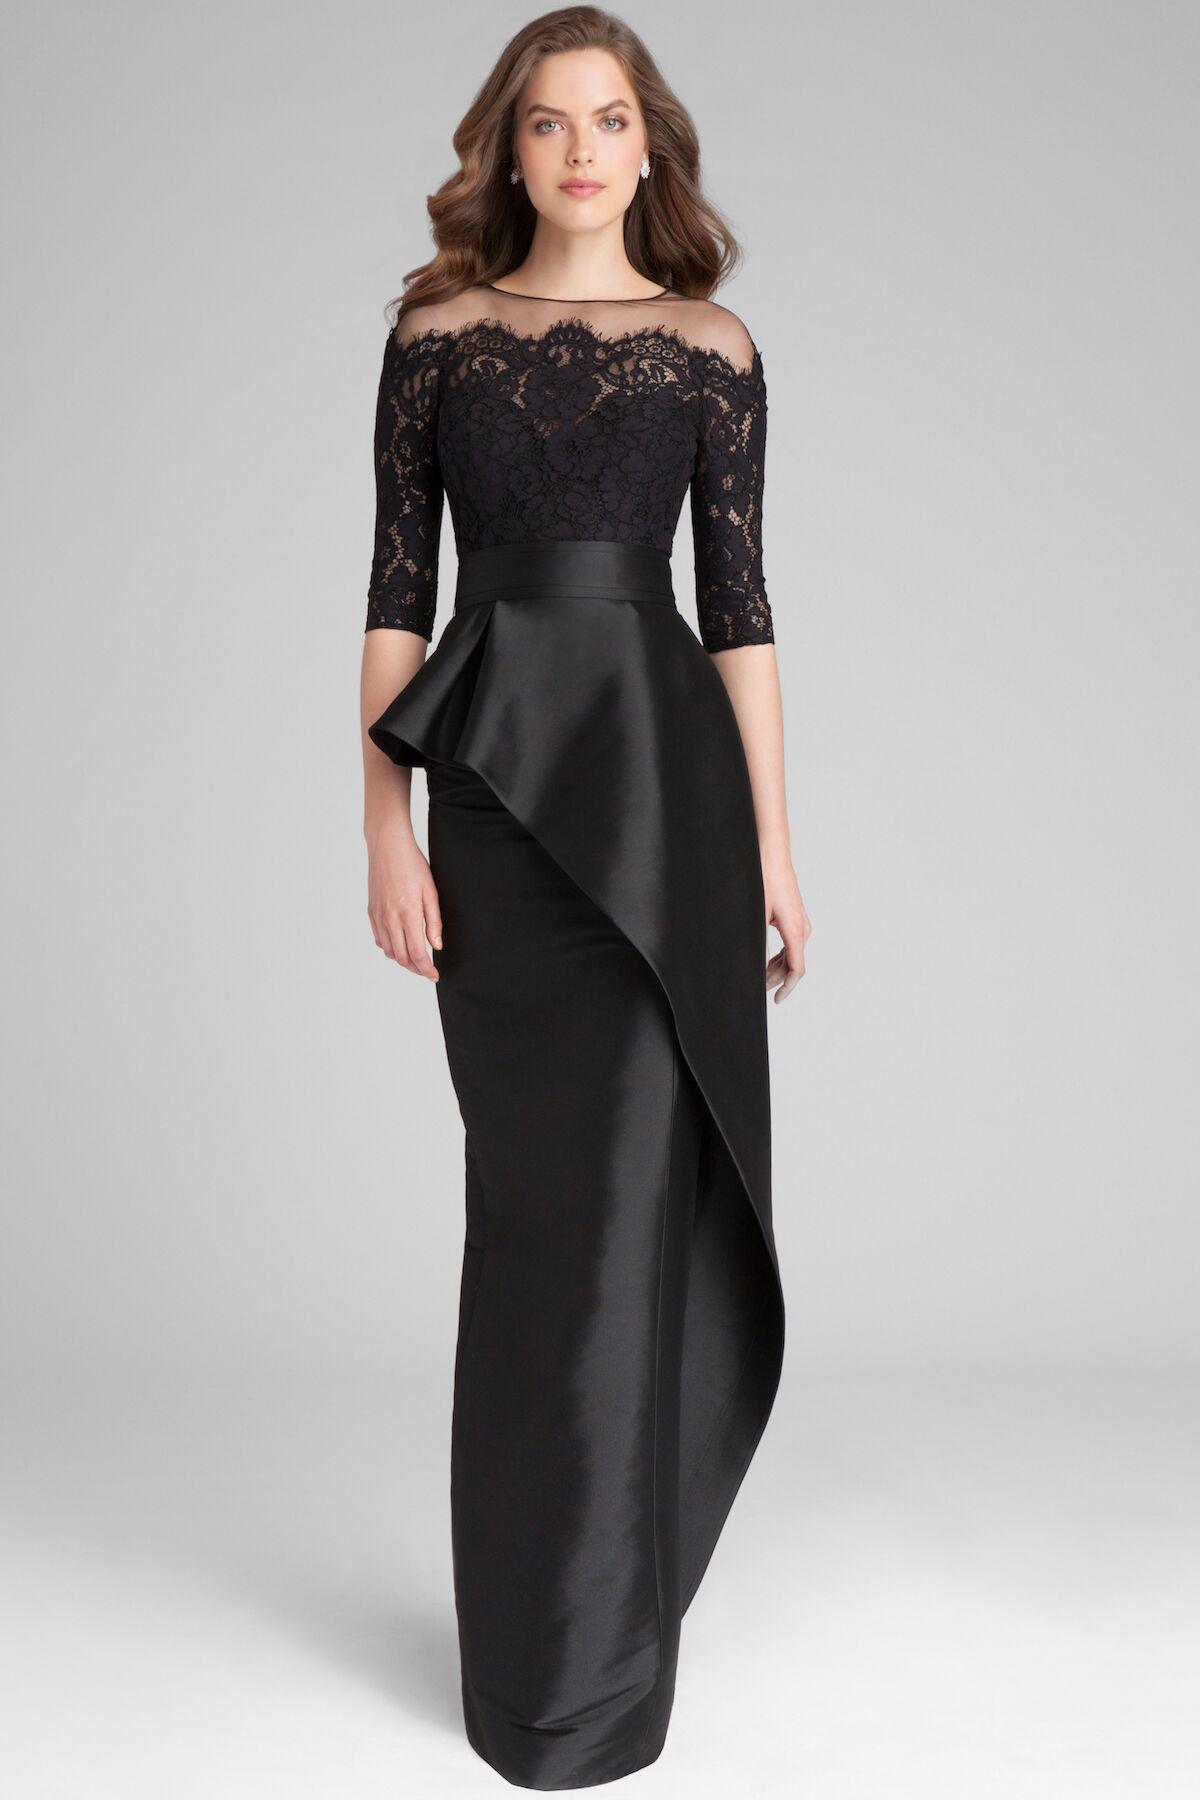 3 4 Sleeve Black Lace Peplum Gown Teri Jon Black Tie Event Dresses Peplum Gown Black Tie Gown [ 1800 x 1200 Pixel ]